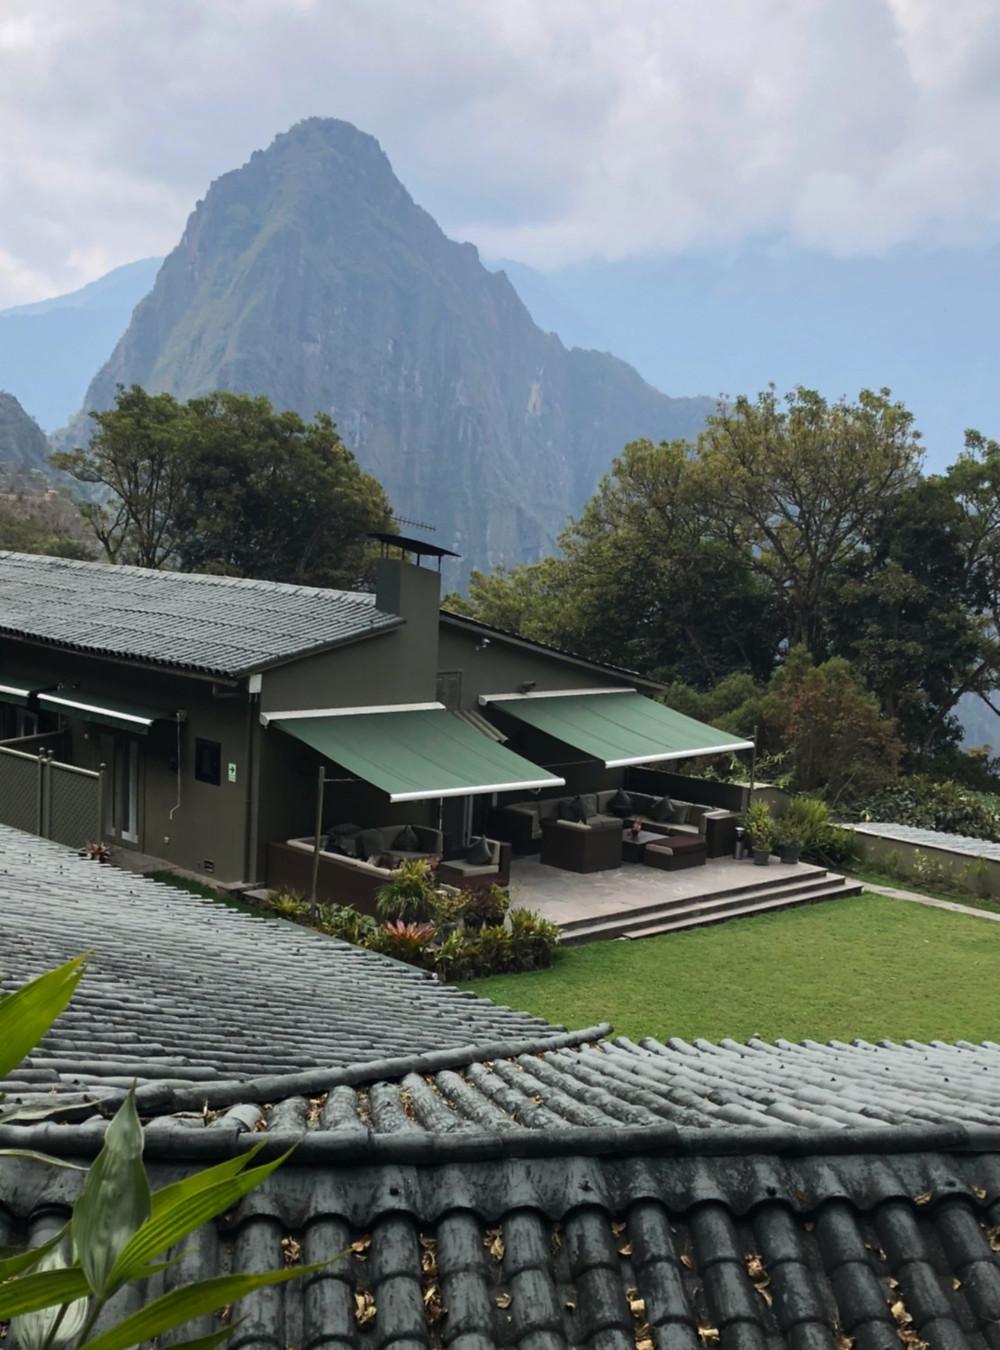 Belmond Sanctuary Lodge, Peru (the closest hotel to Machu Picchu) - photo credit: www.paradoxtravels.com